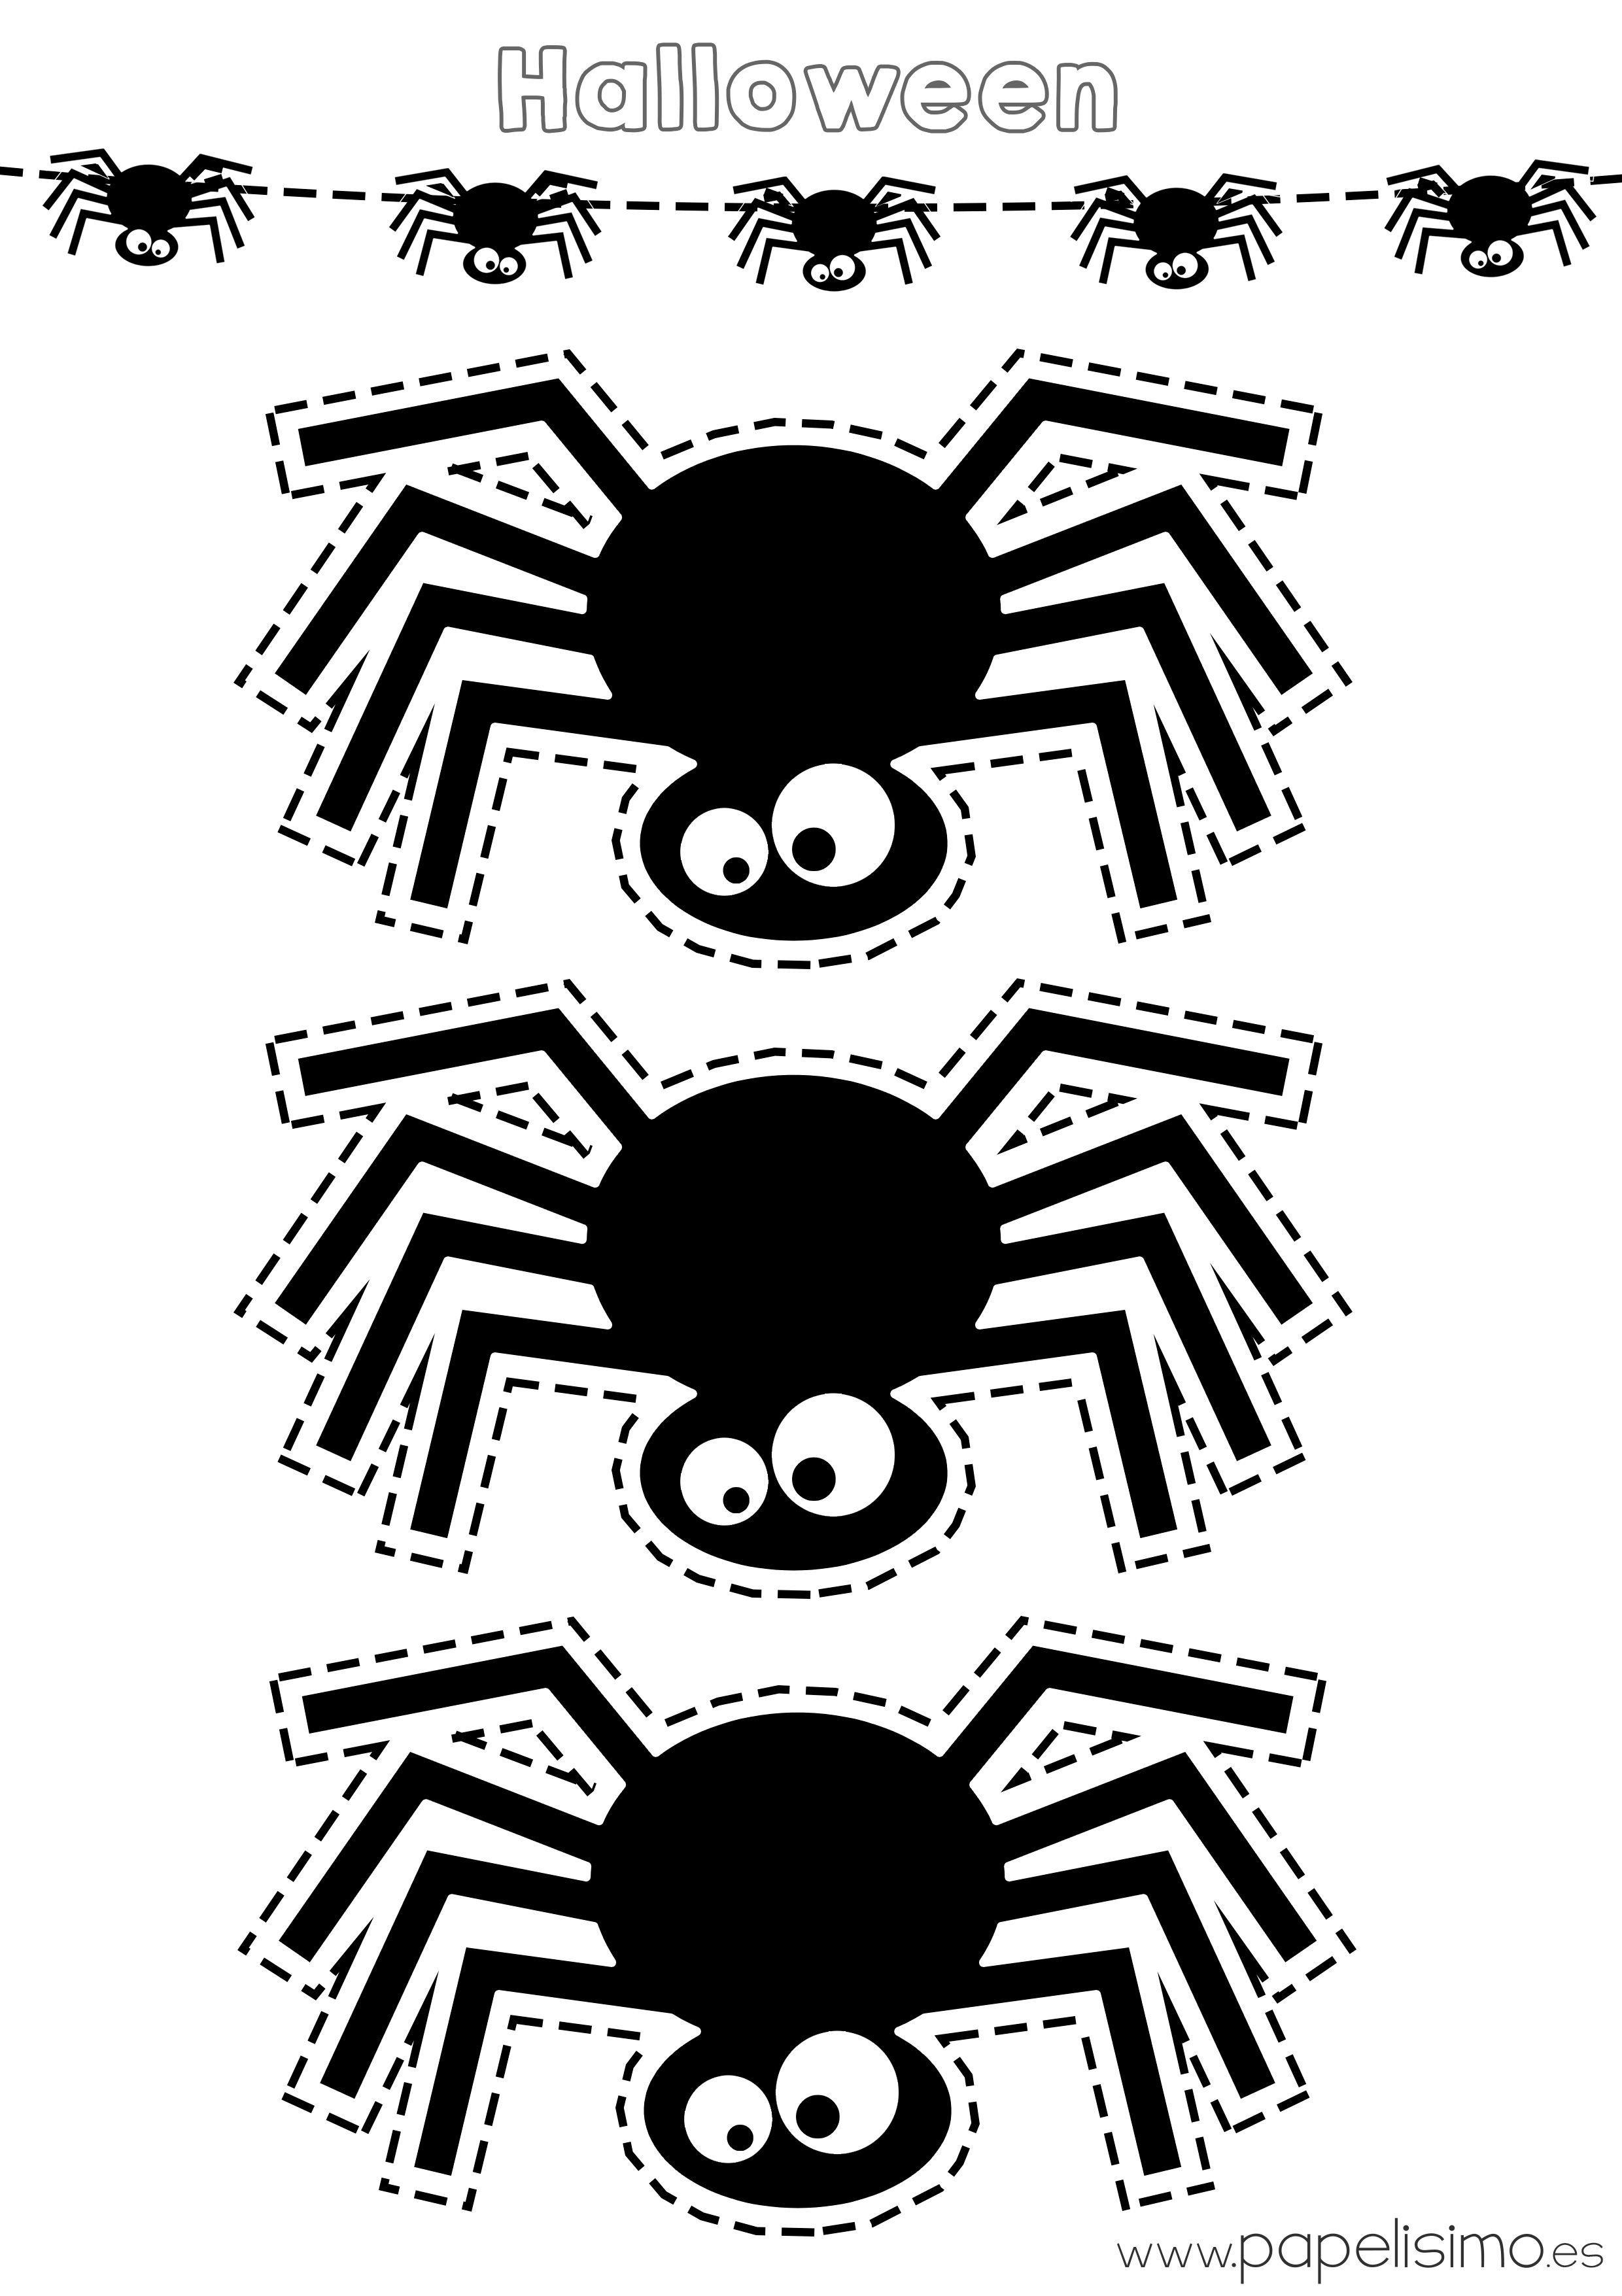 Plantilla Arana Halloween Imprimir Y Recortar Desenhos Do Dia Das Bruxas Coisas De Halloween Halloween